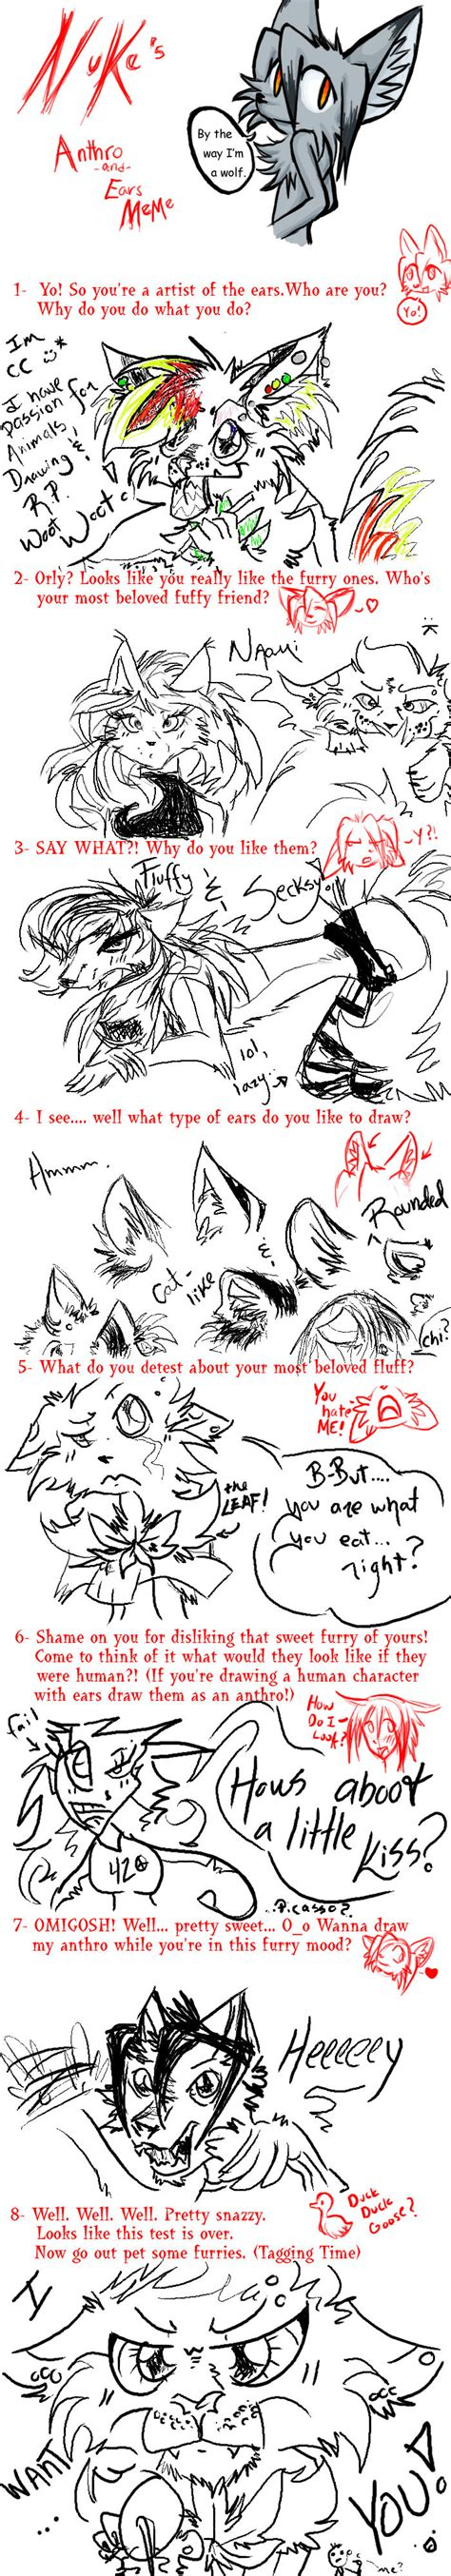 Furry Meme - furry meme by meow4me420 on deviantart